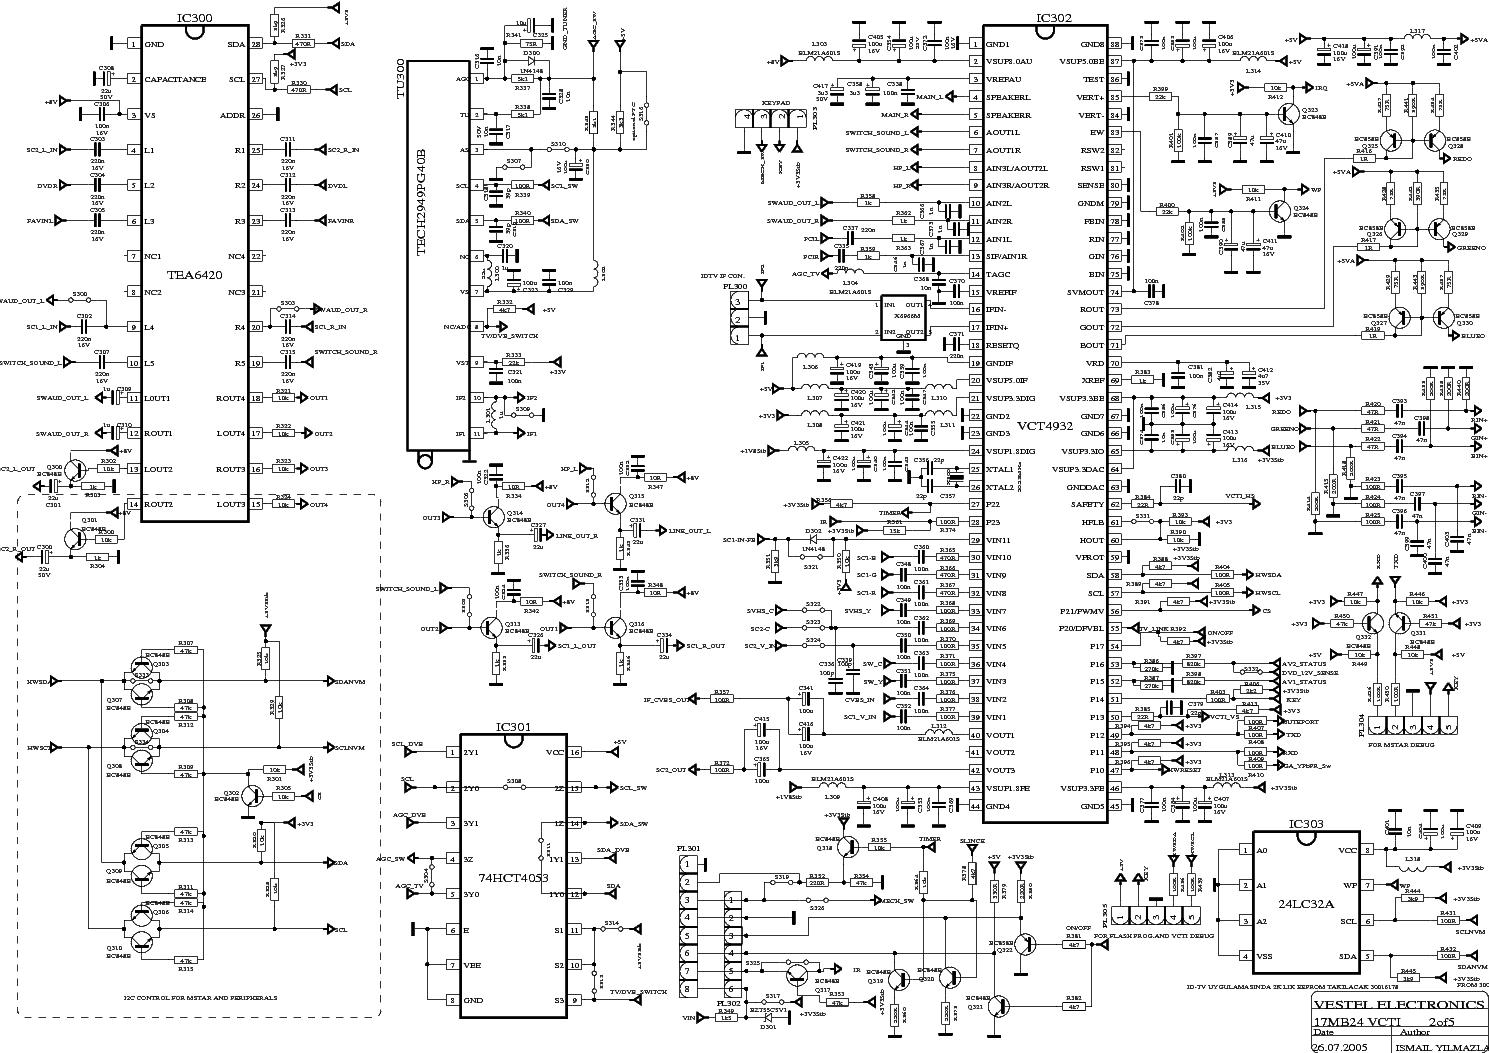 VESTEL 17MB24 SCH Service Manual download, schematics